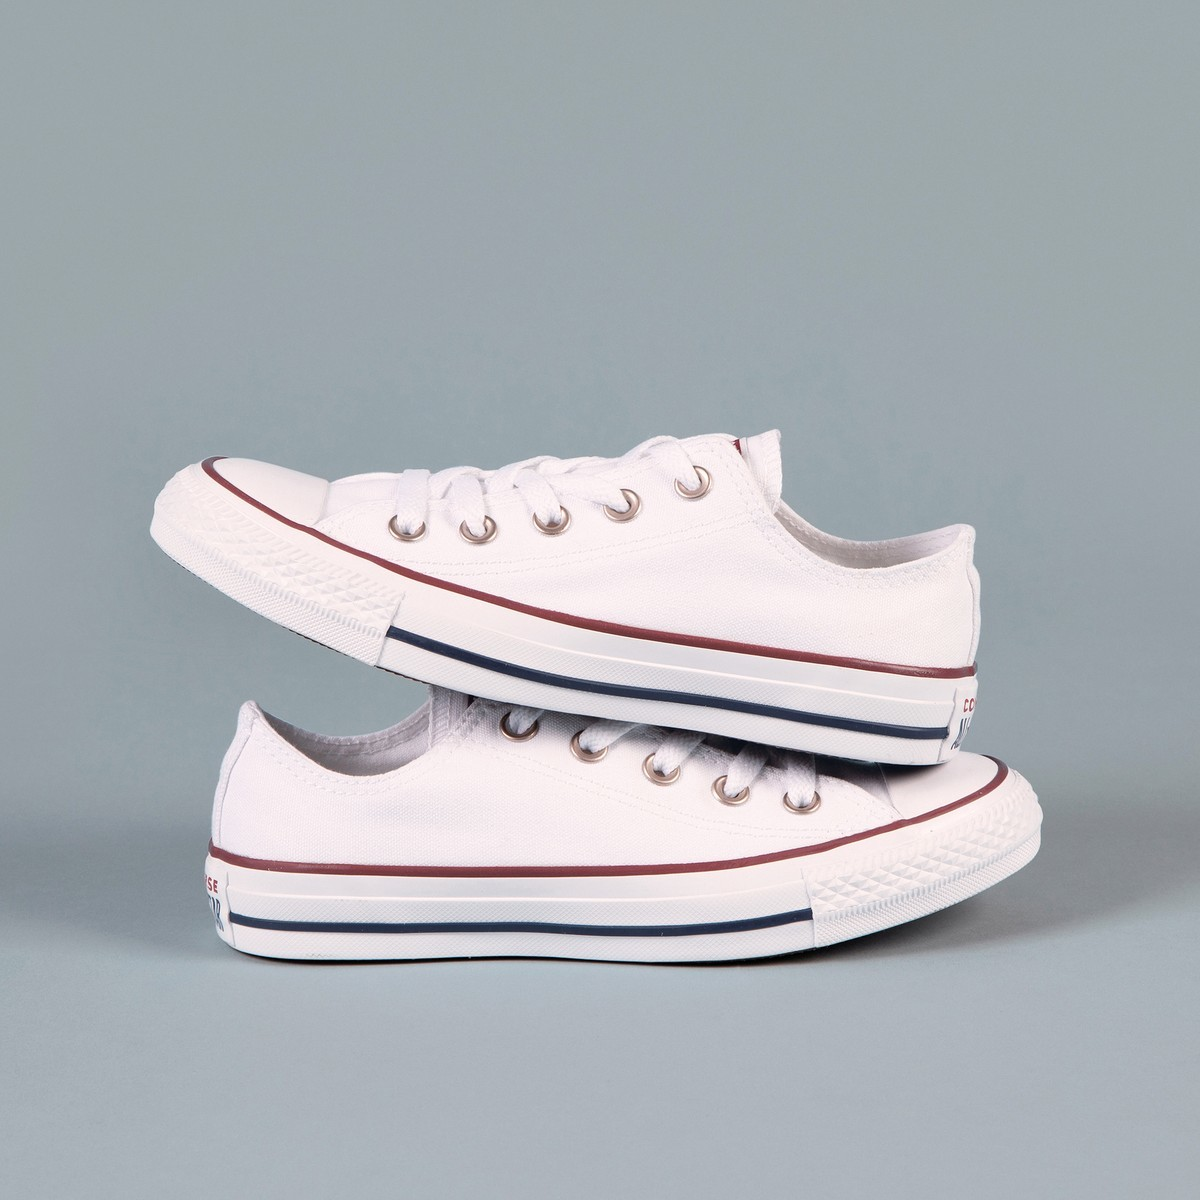 402b0e61d Ofertas del día en zapatillas: Adidas, Vans o Kelme